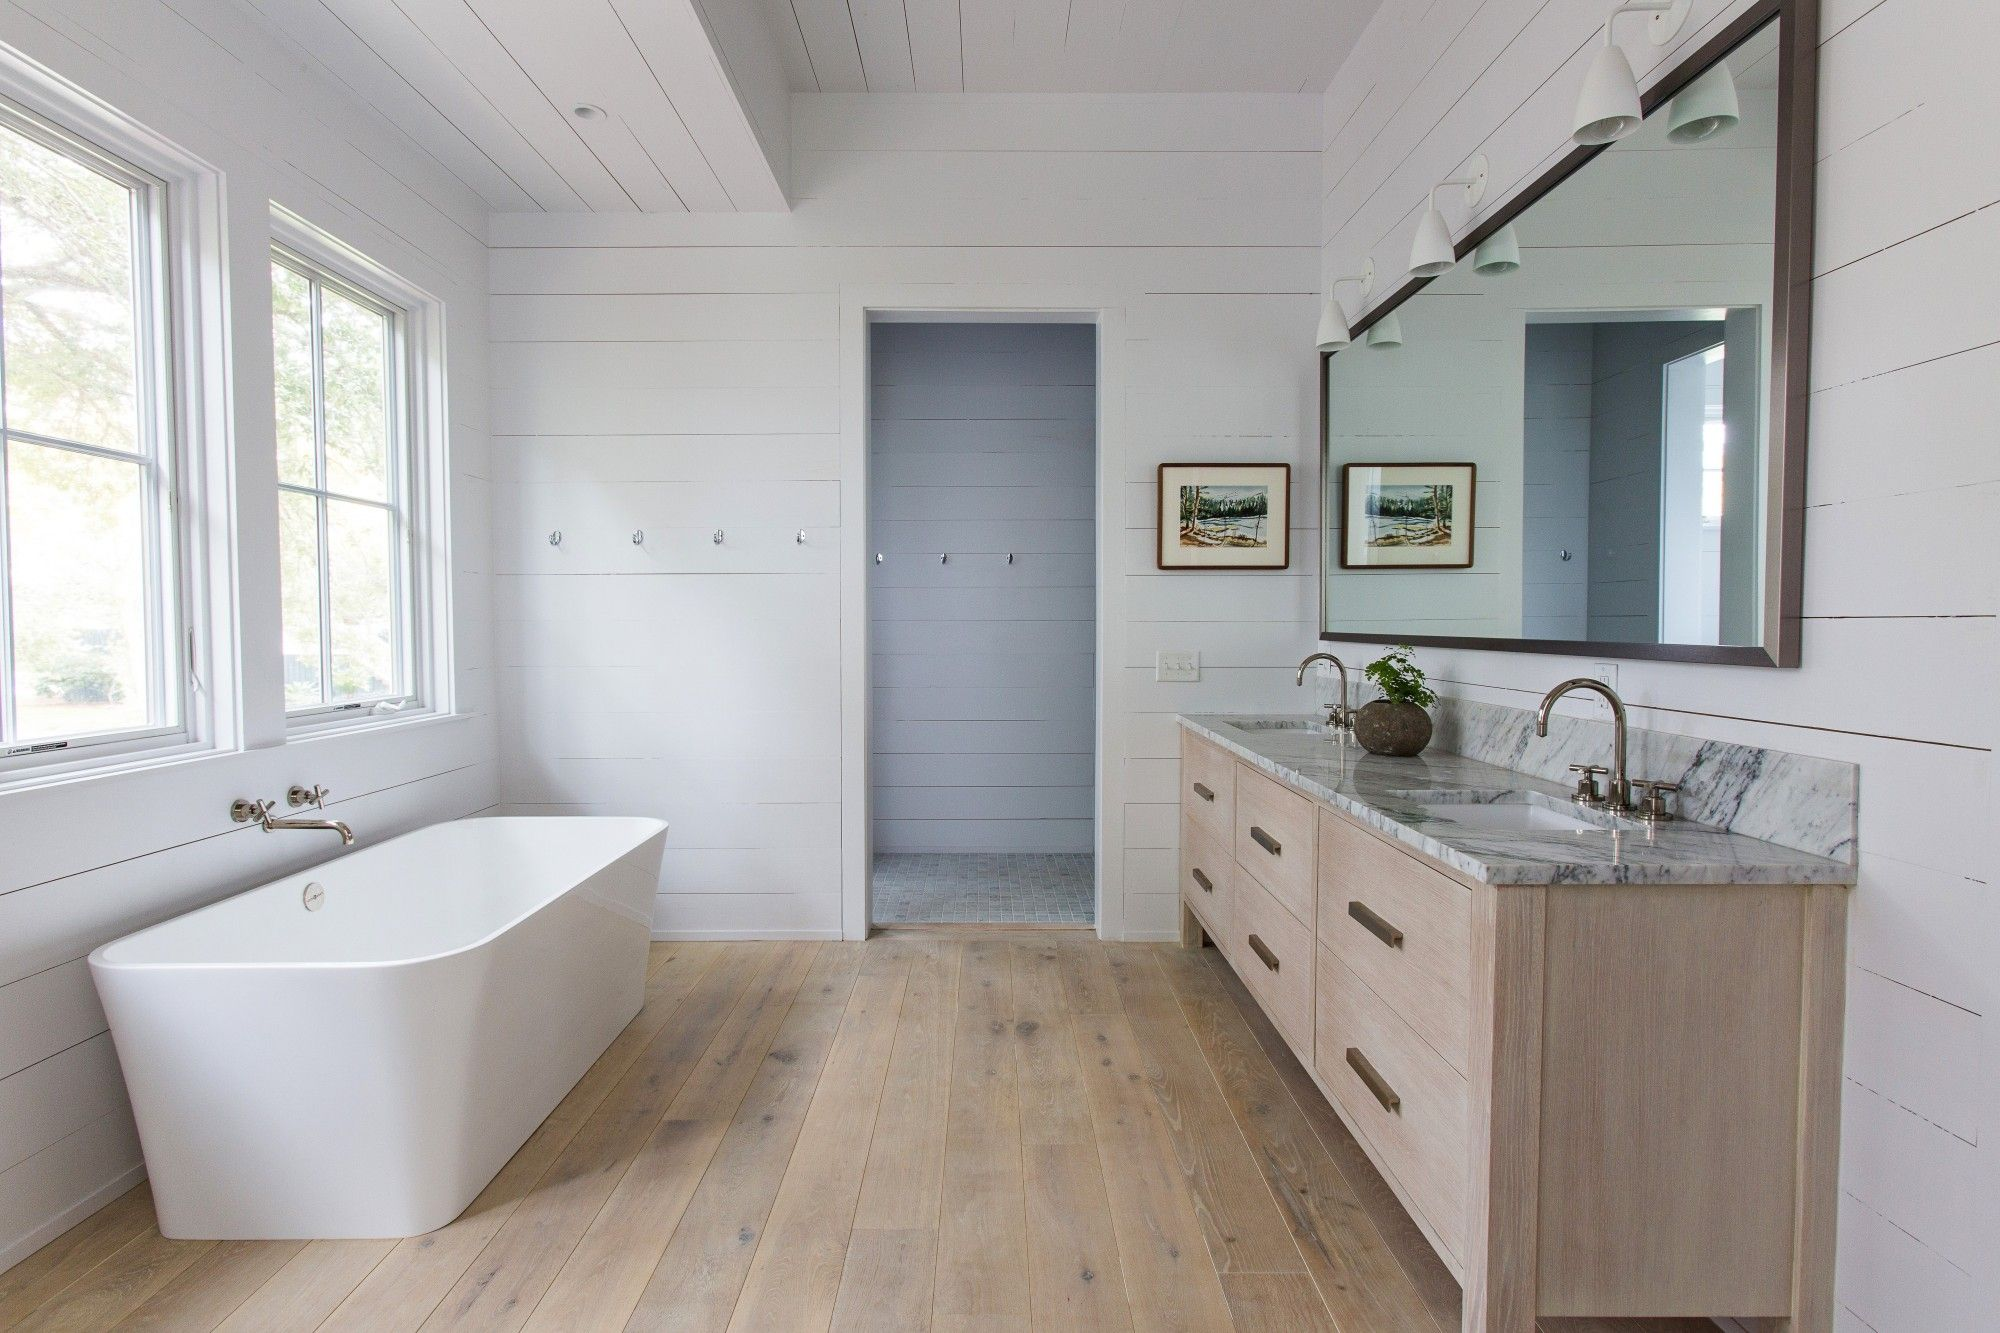 Prime Guide To Custom Bathroom Vanity Styles Home Beach Download Free Architecture Designs Estepponolmadebymaigaardcom